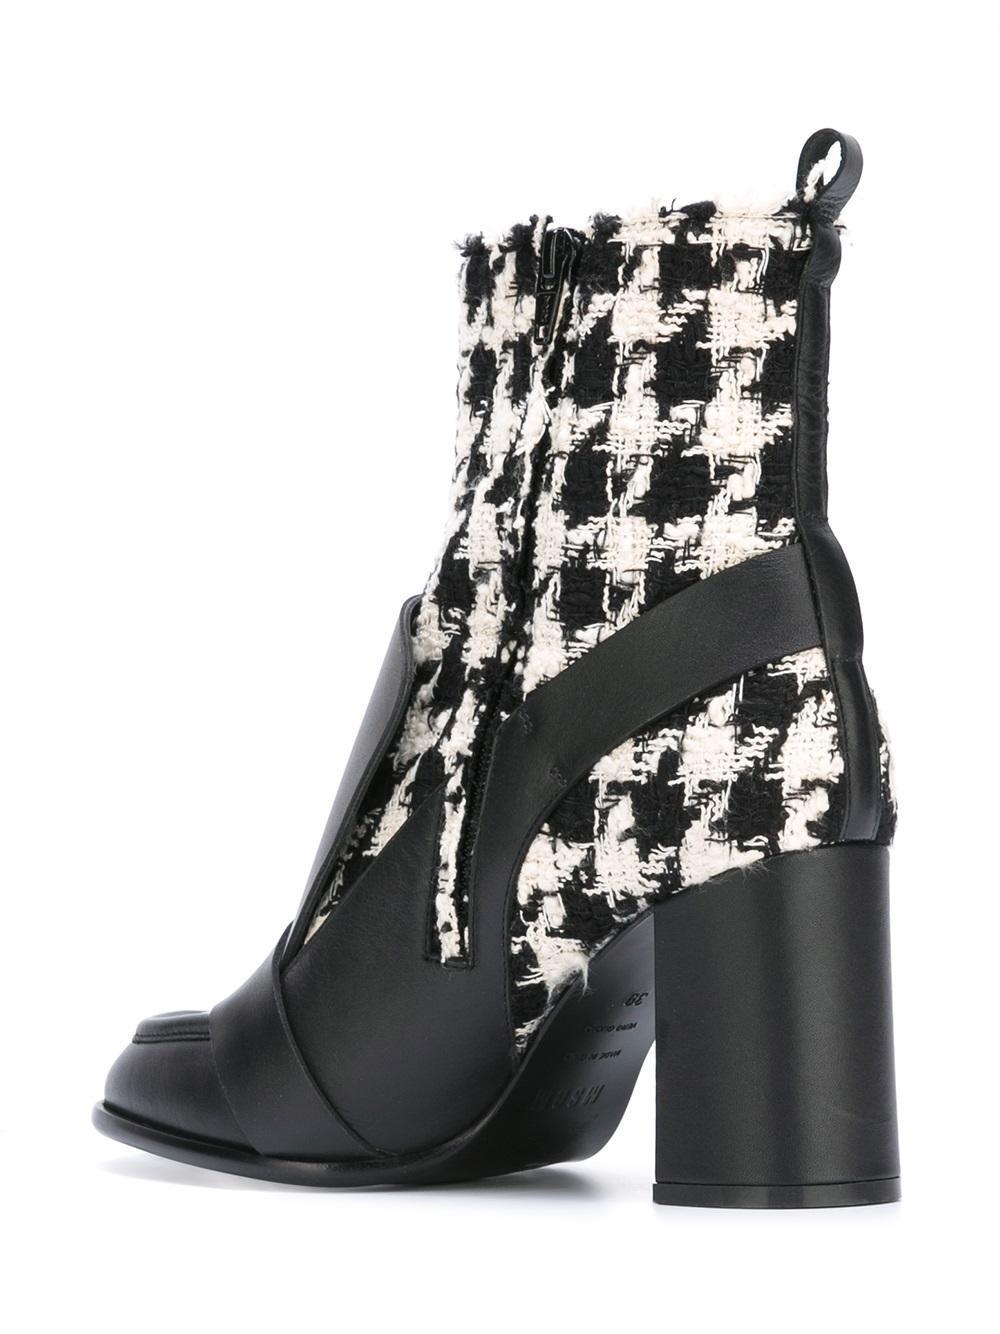 MSGM Tweed Biker Ankle Boots in Black